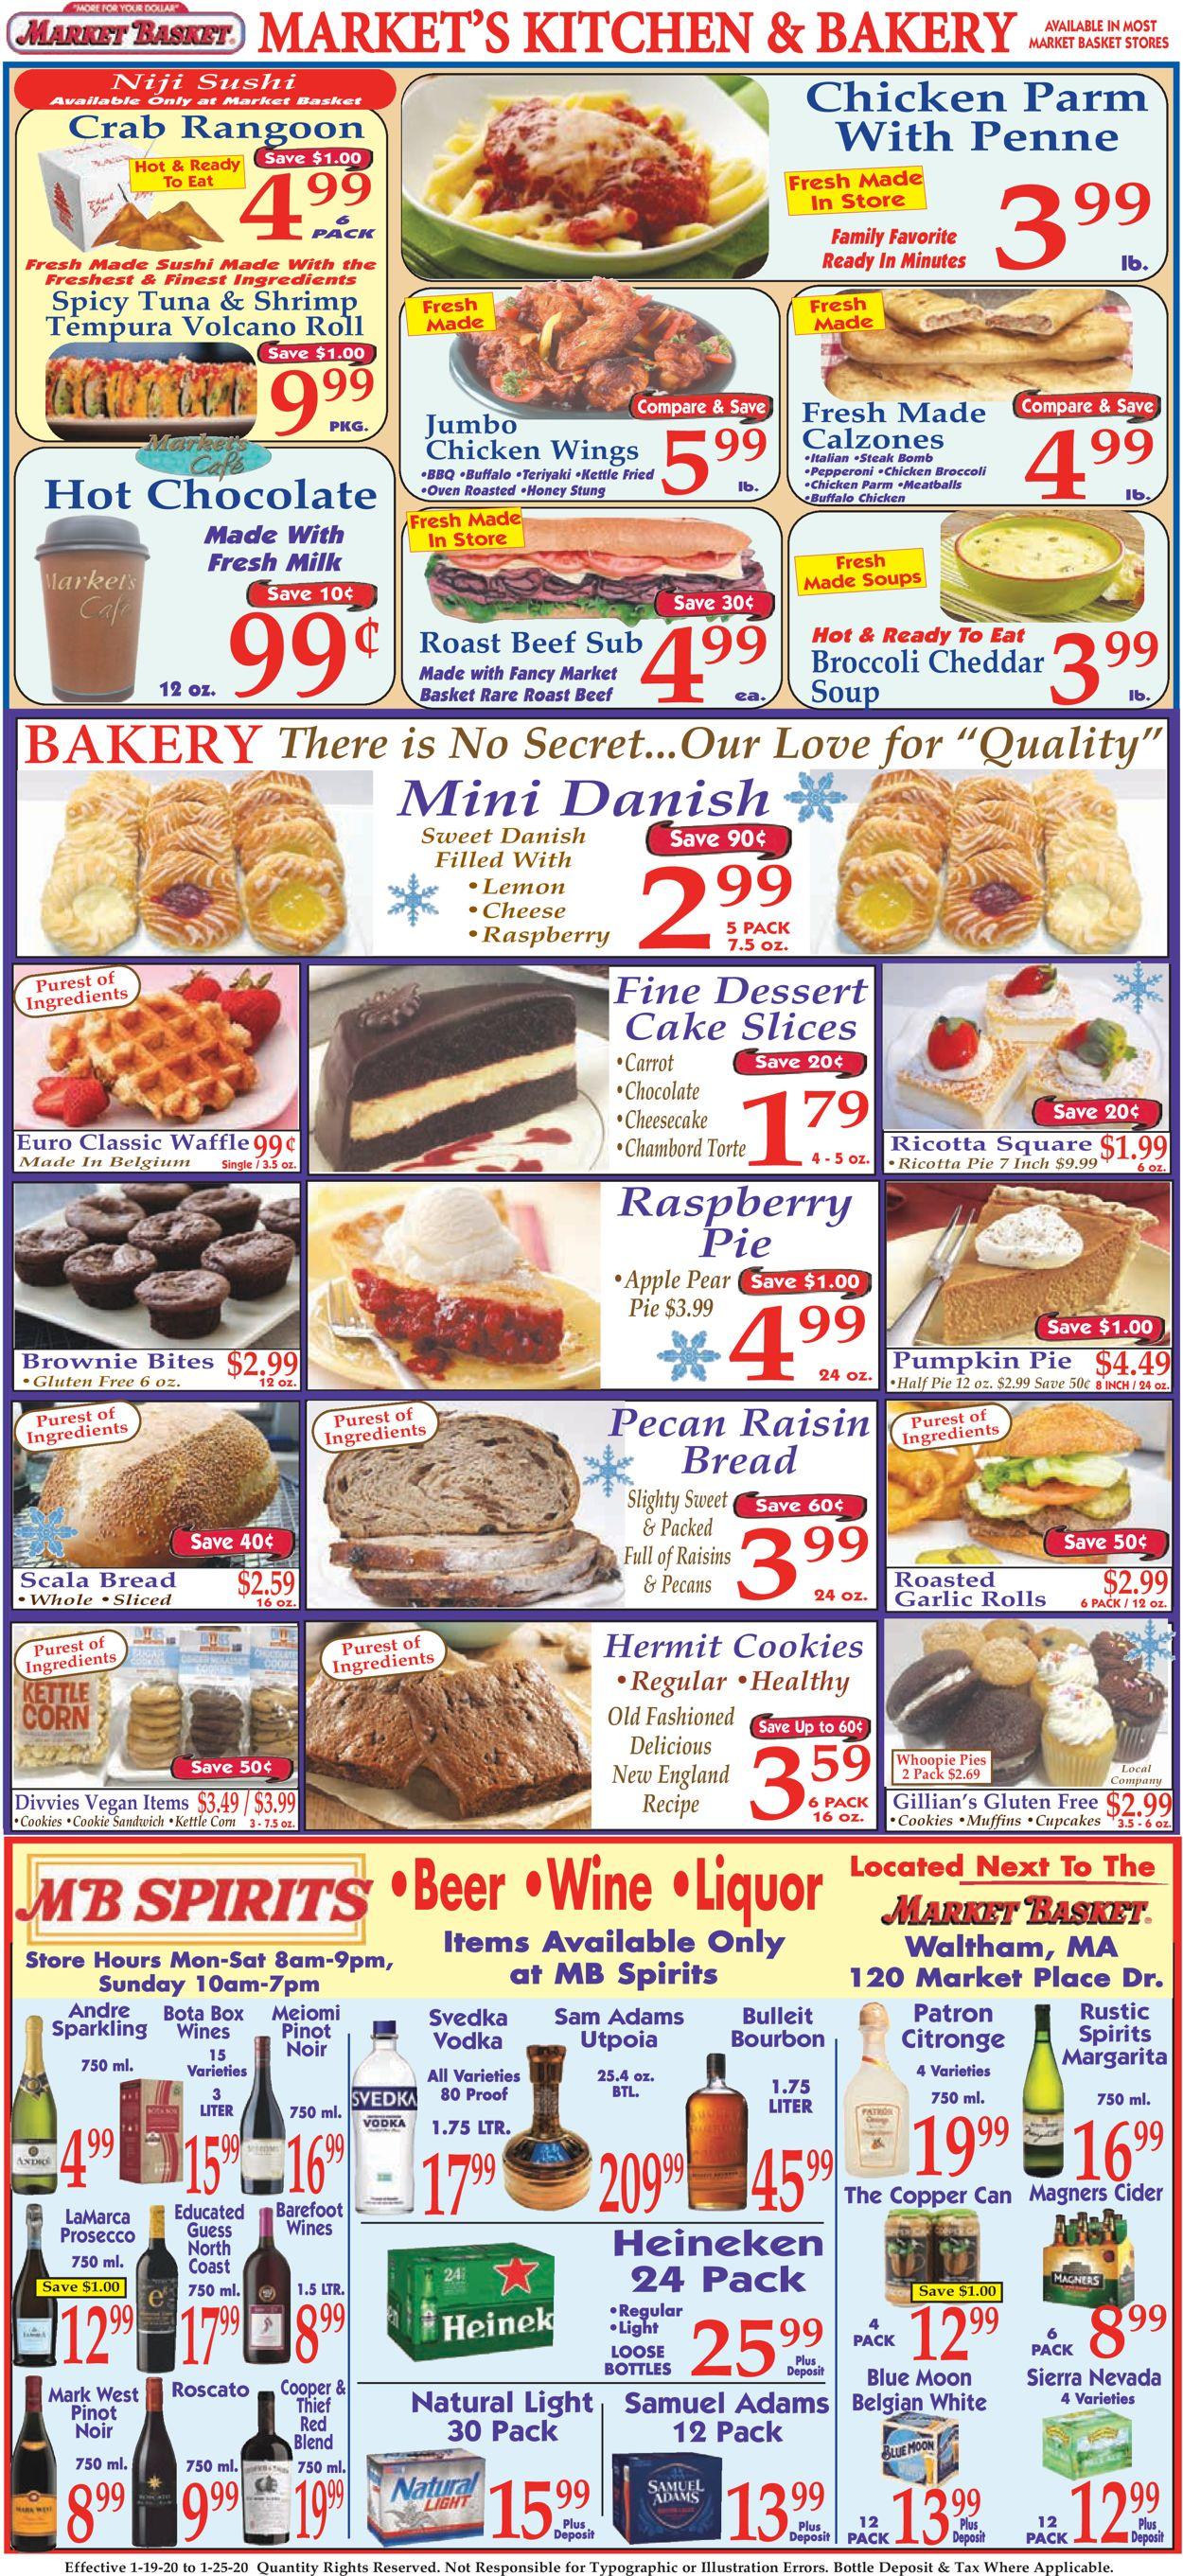 Market Basket Bakery Christmas 2020 Market Basket Current weekly ad 01/19   01/25/2020 [10]   frequent